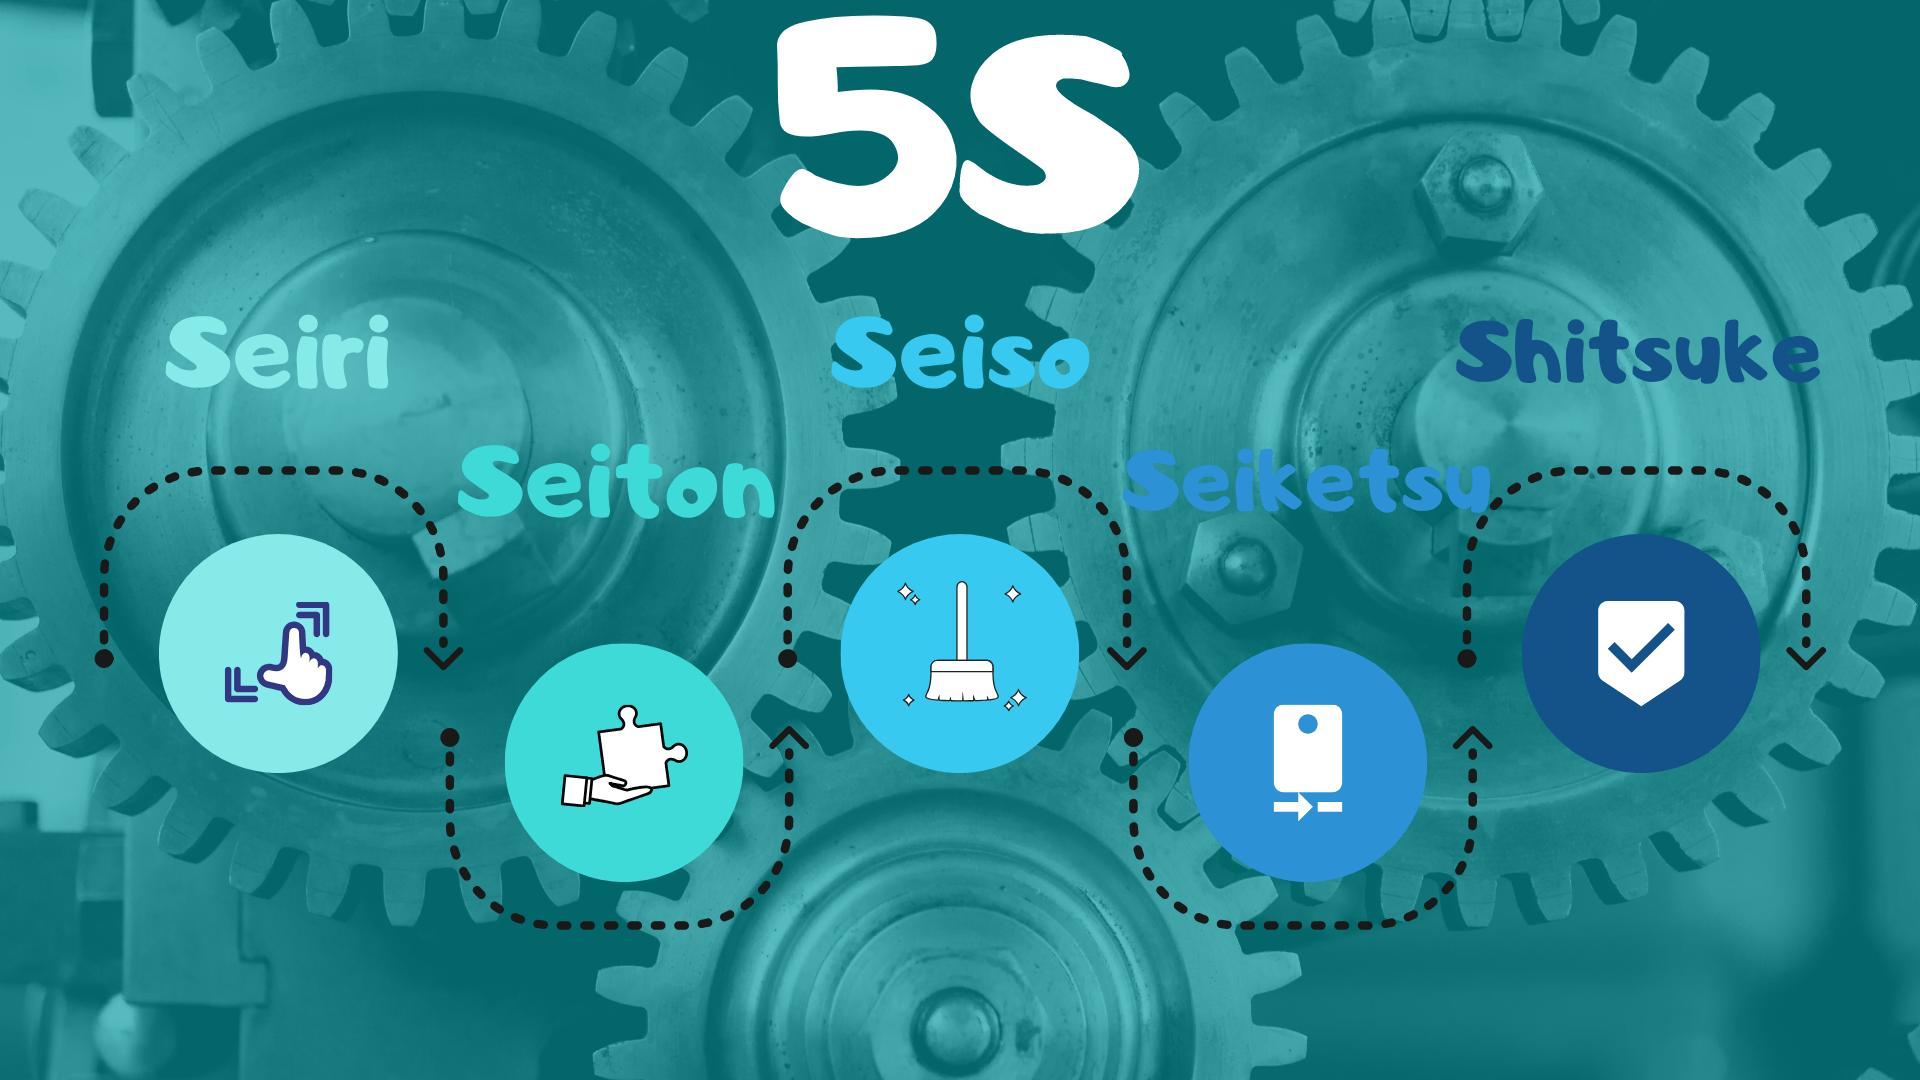 5S rendszer_5S_system_leantoolbox